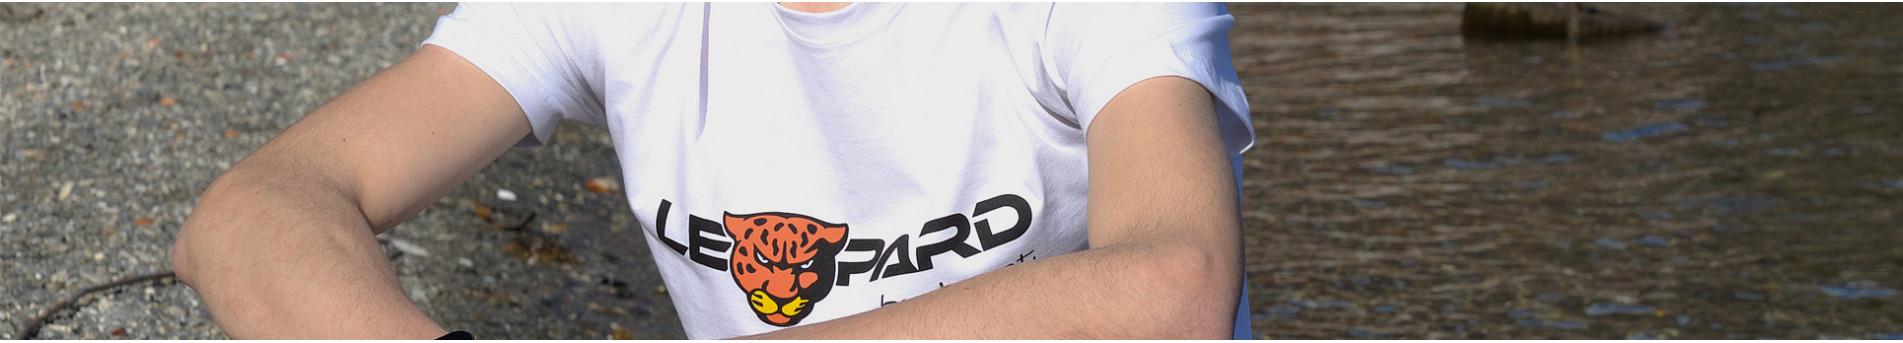 Leopard T-Shirt uomo